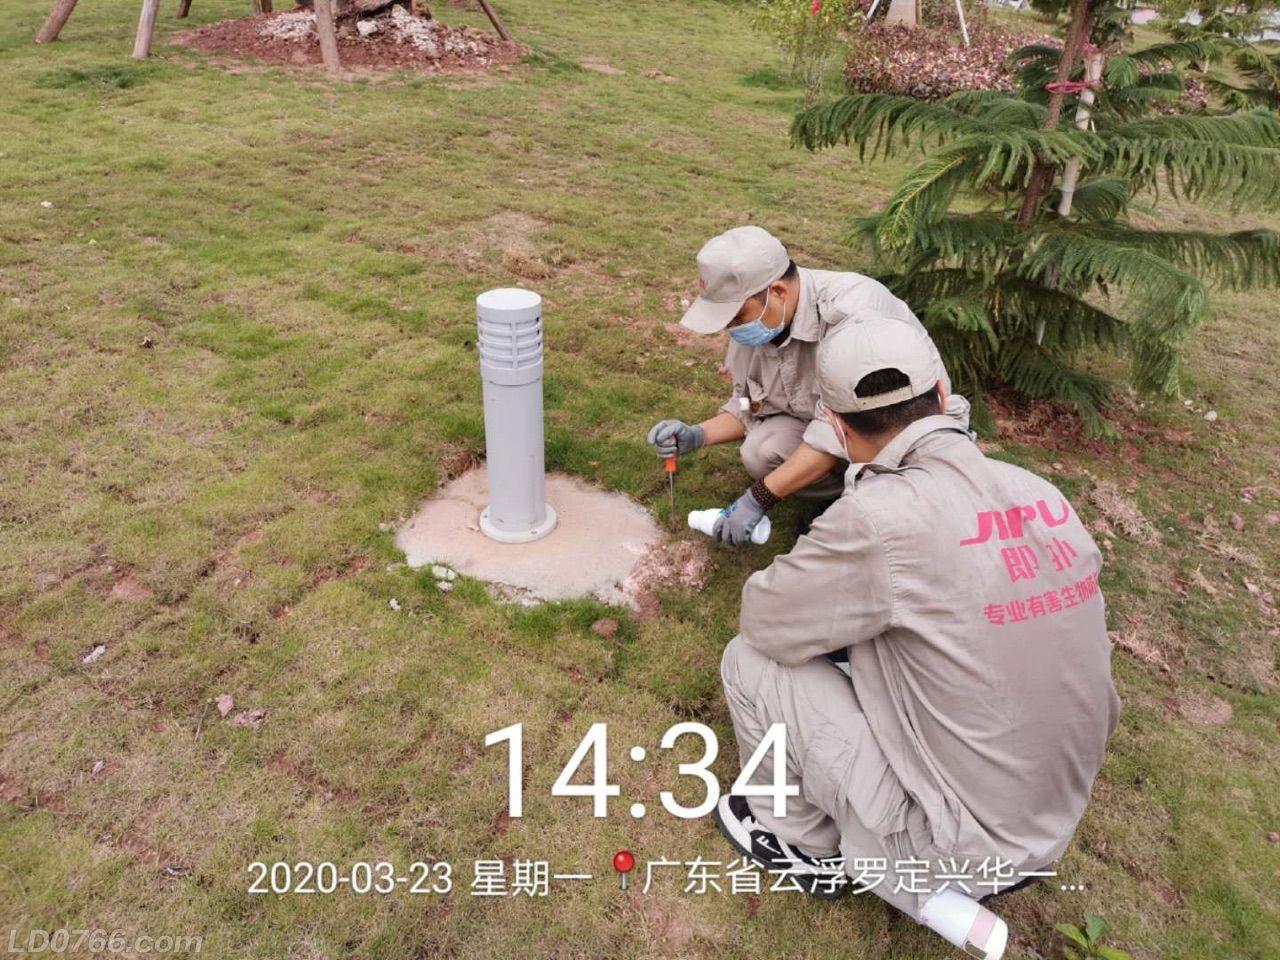 Fuy-i79lkIaNT5LCbUKrGWYTnm-c.jpg